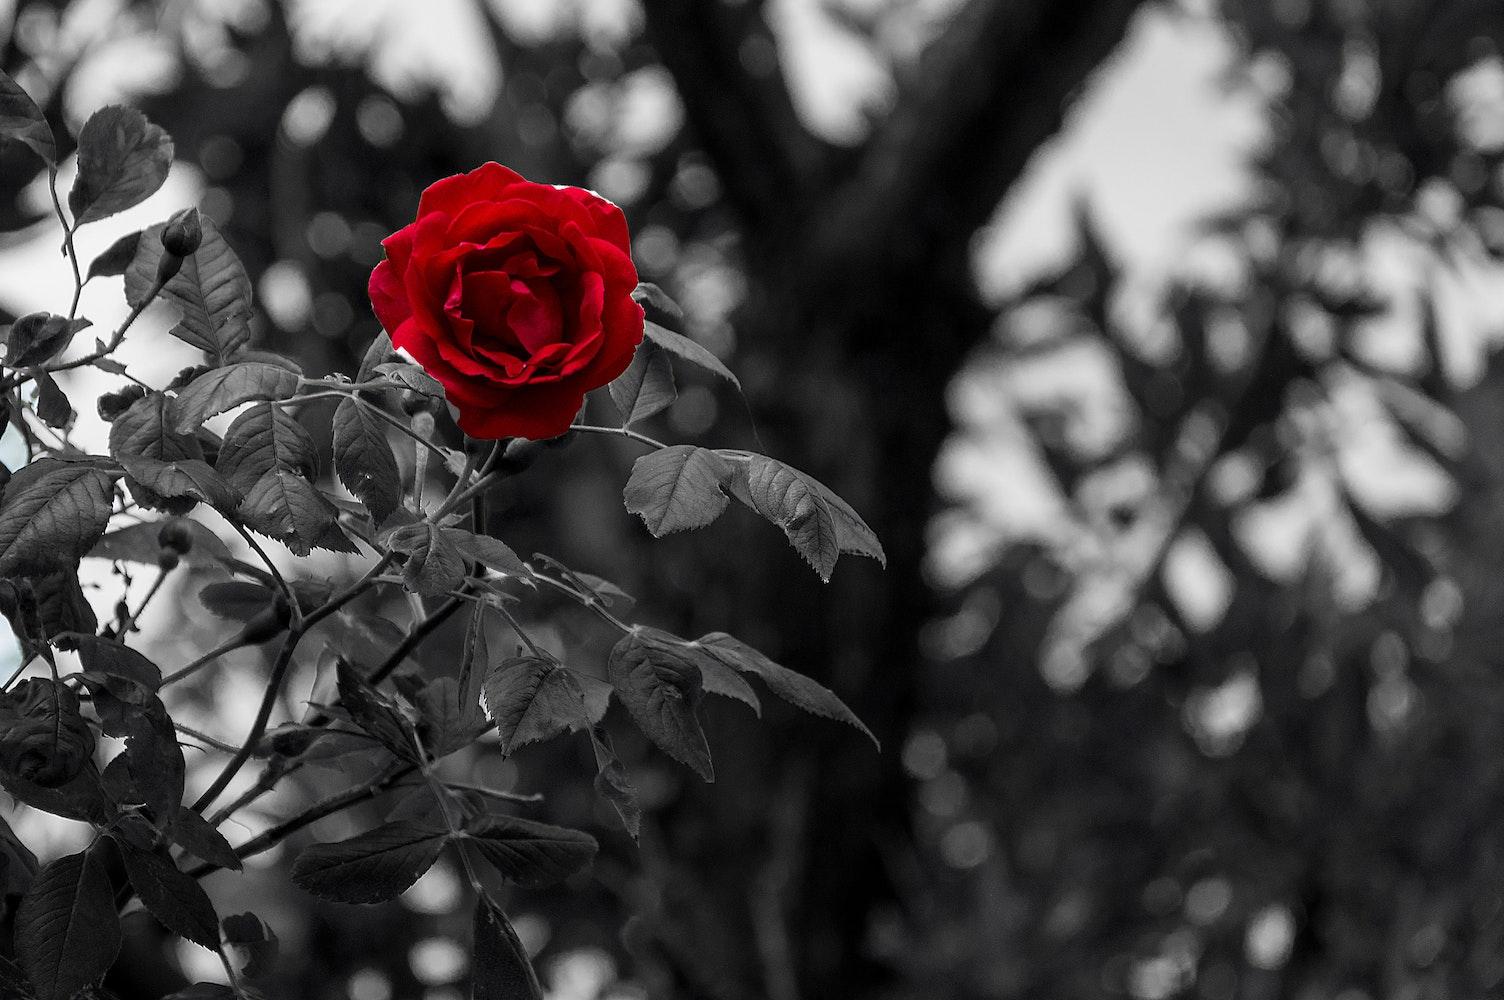 free black and white photography 183 pexels 183 free stock photos